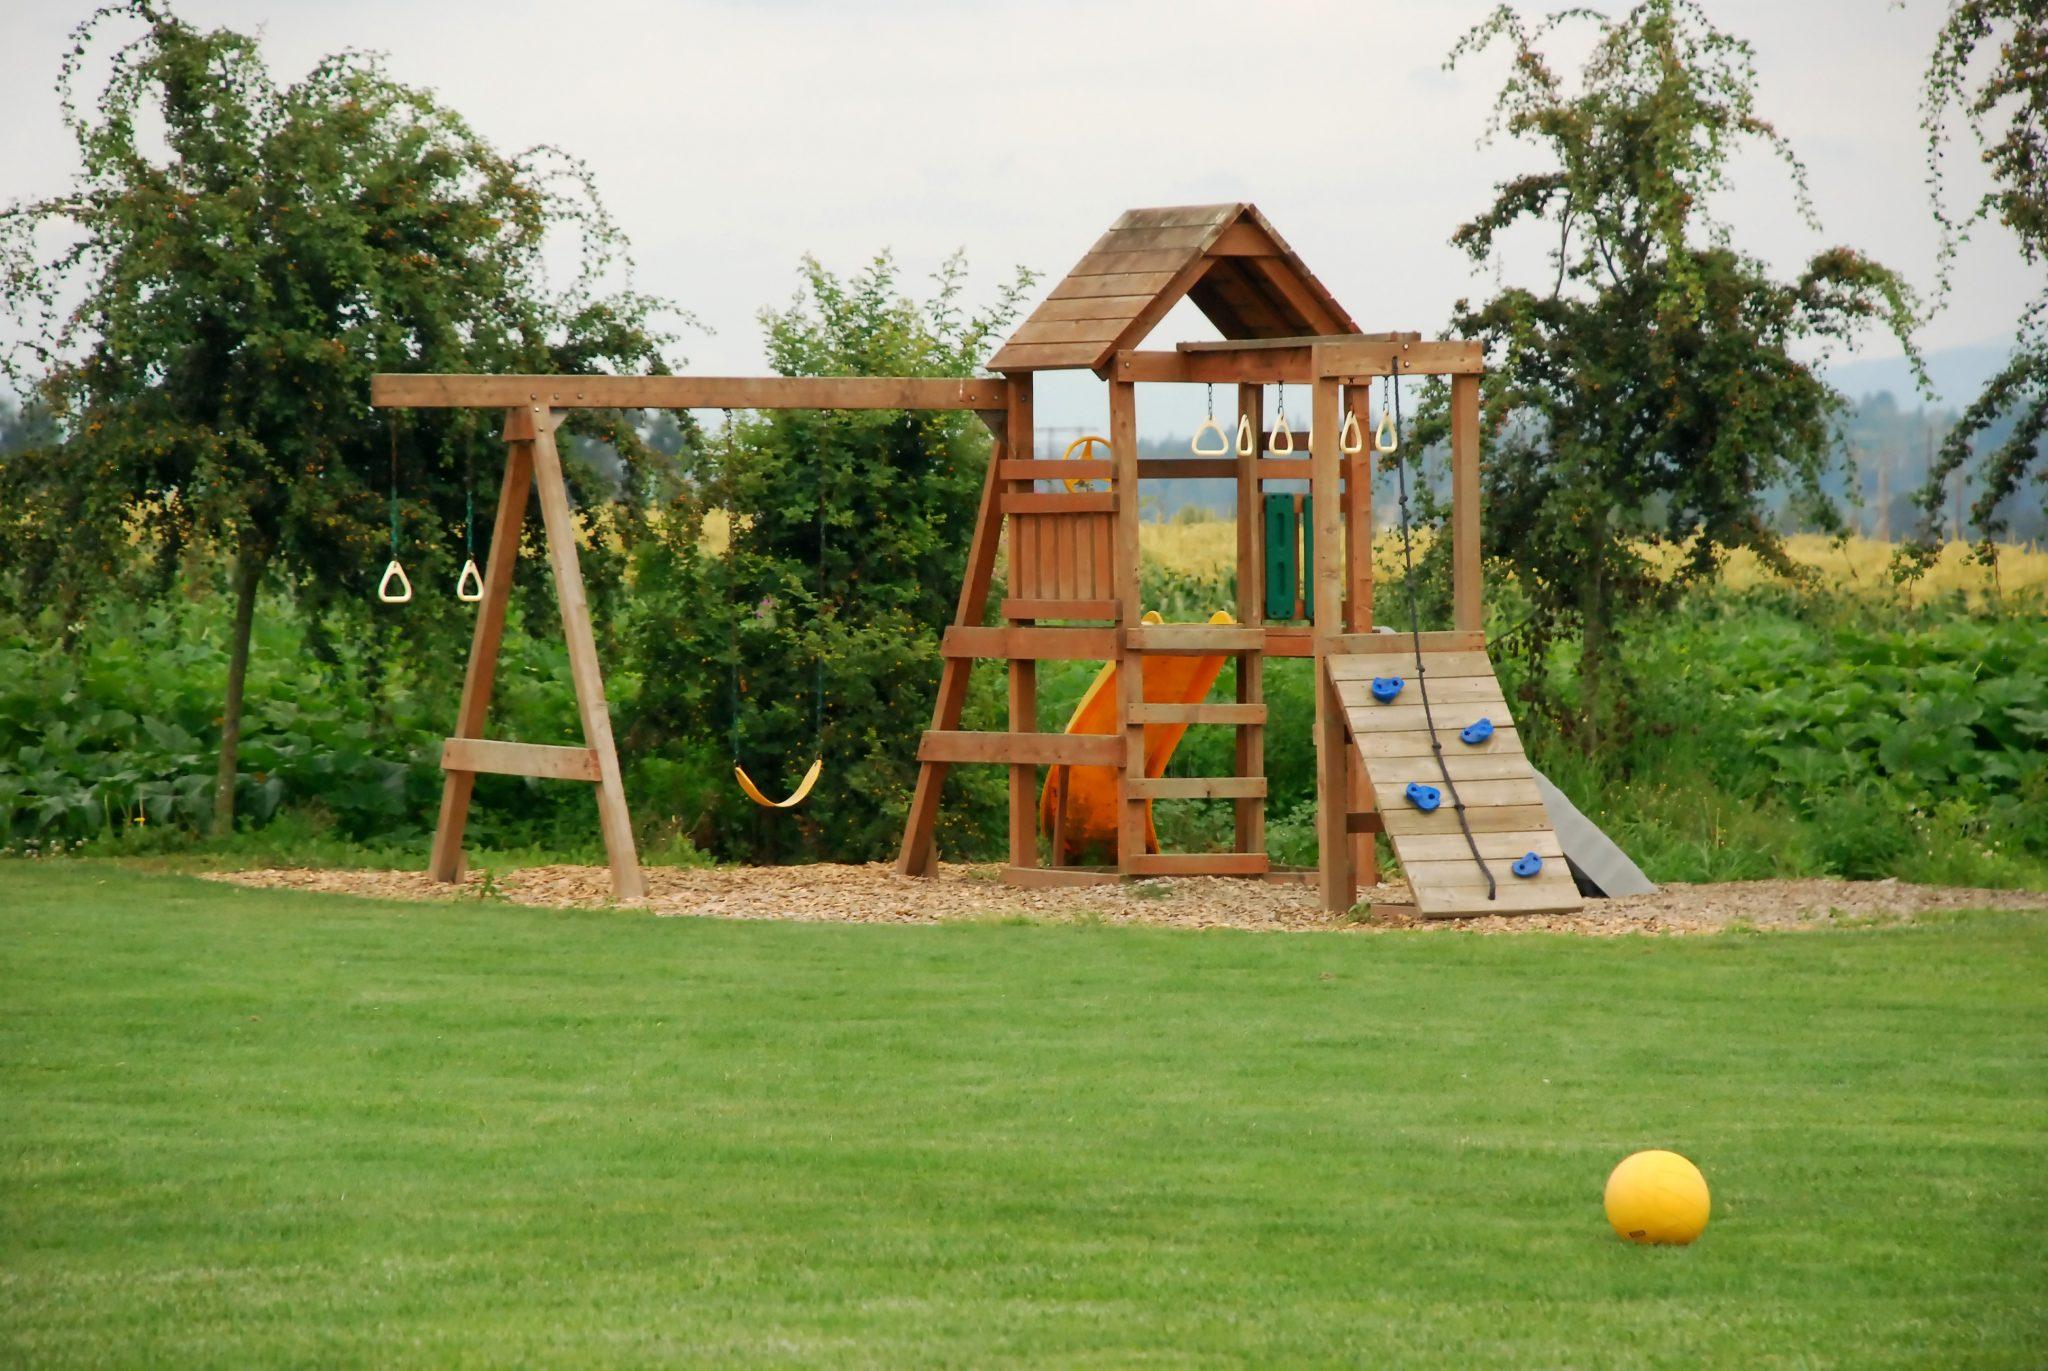 Backyard Playground: Ground Cover Options